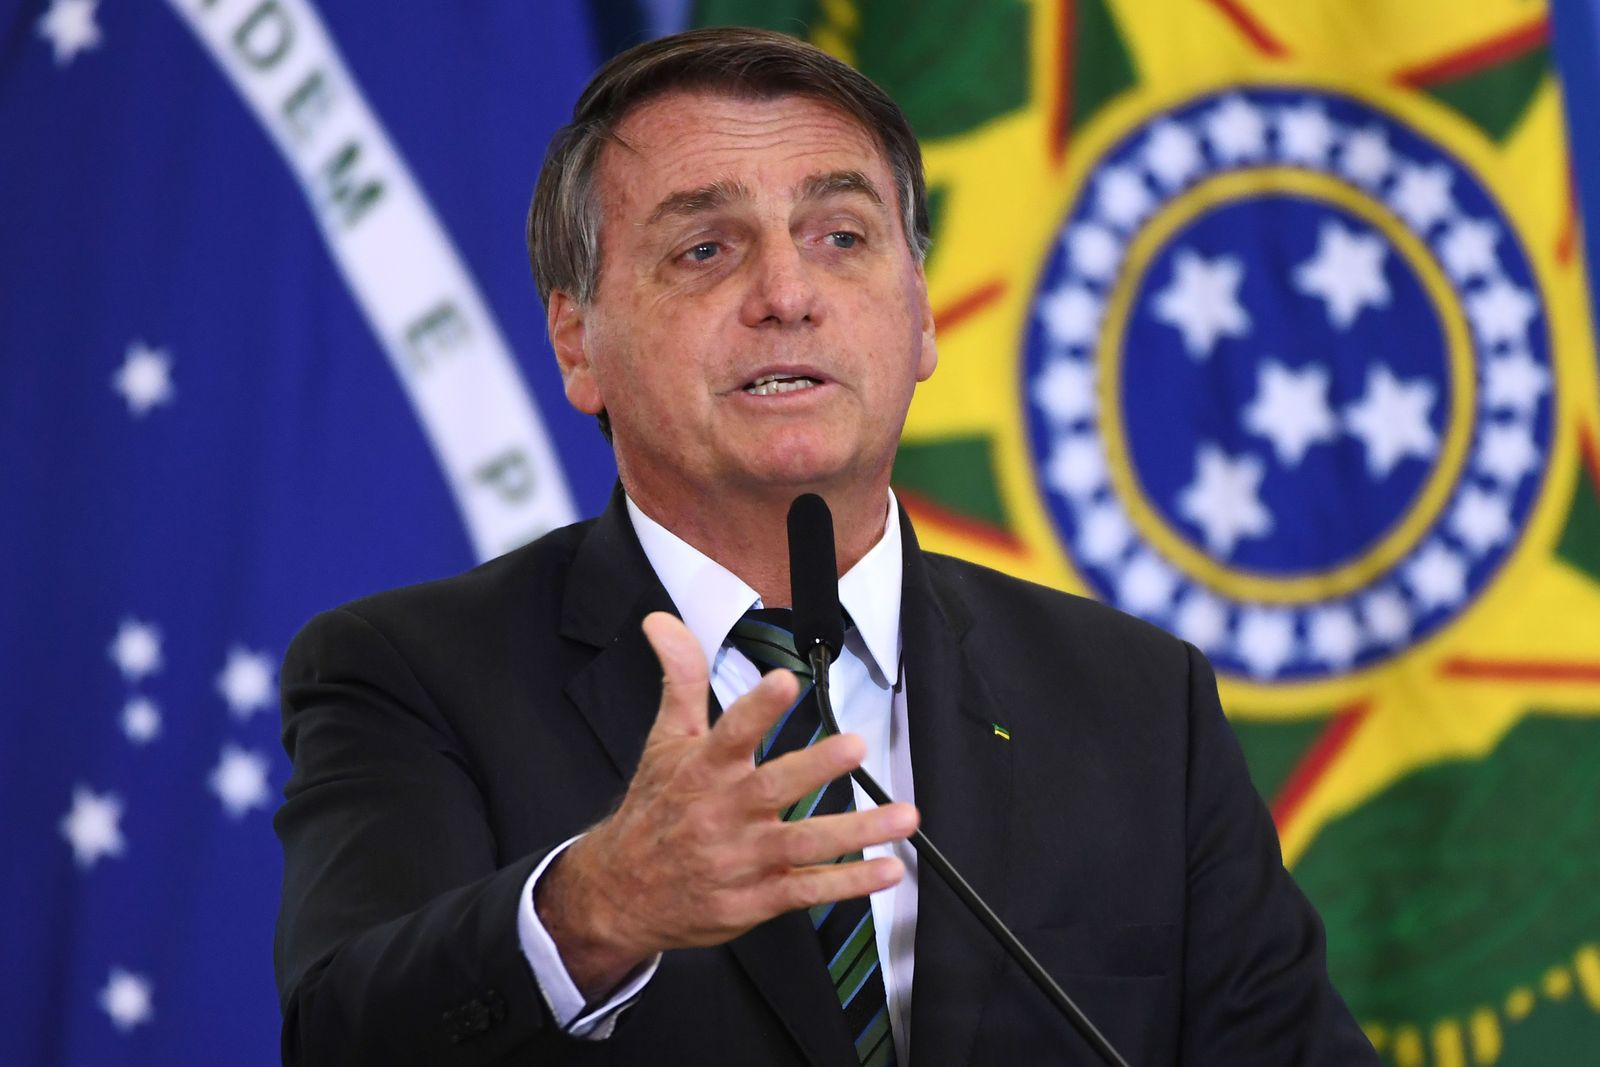 BRAZIL-ENVIRONMENT-NATIONAL PARK-BOLSONARO